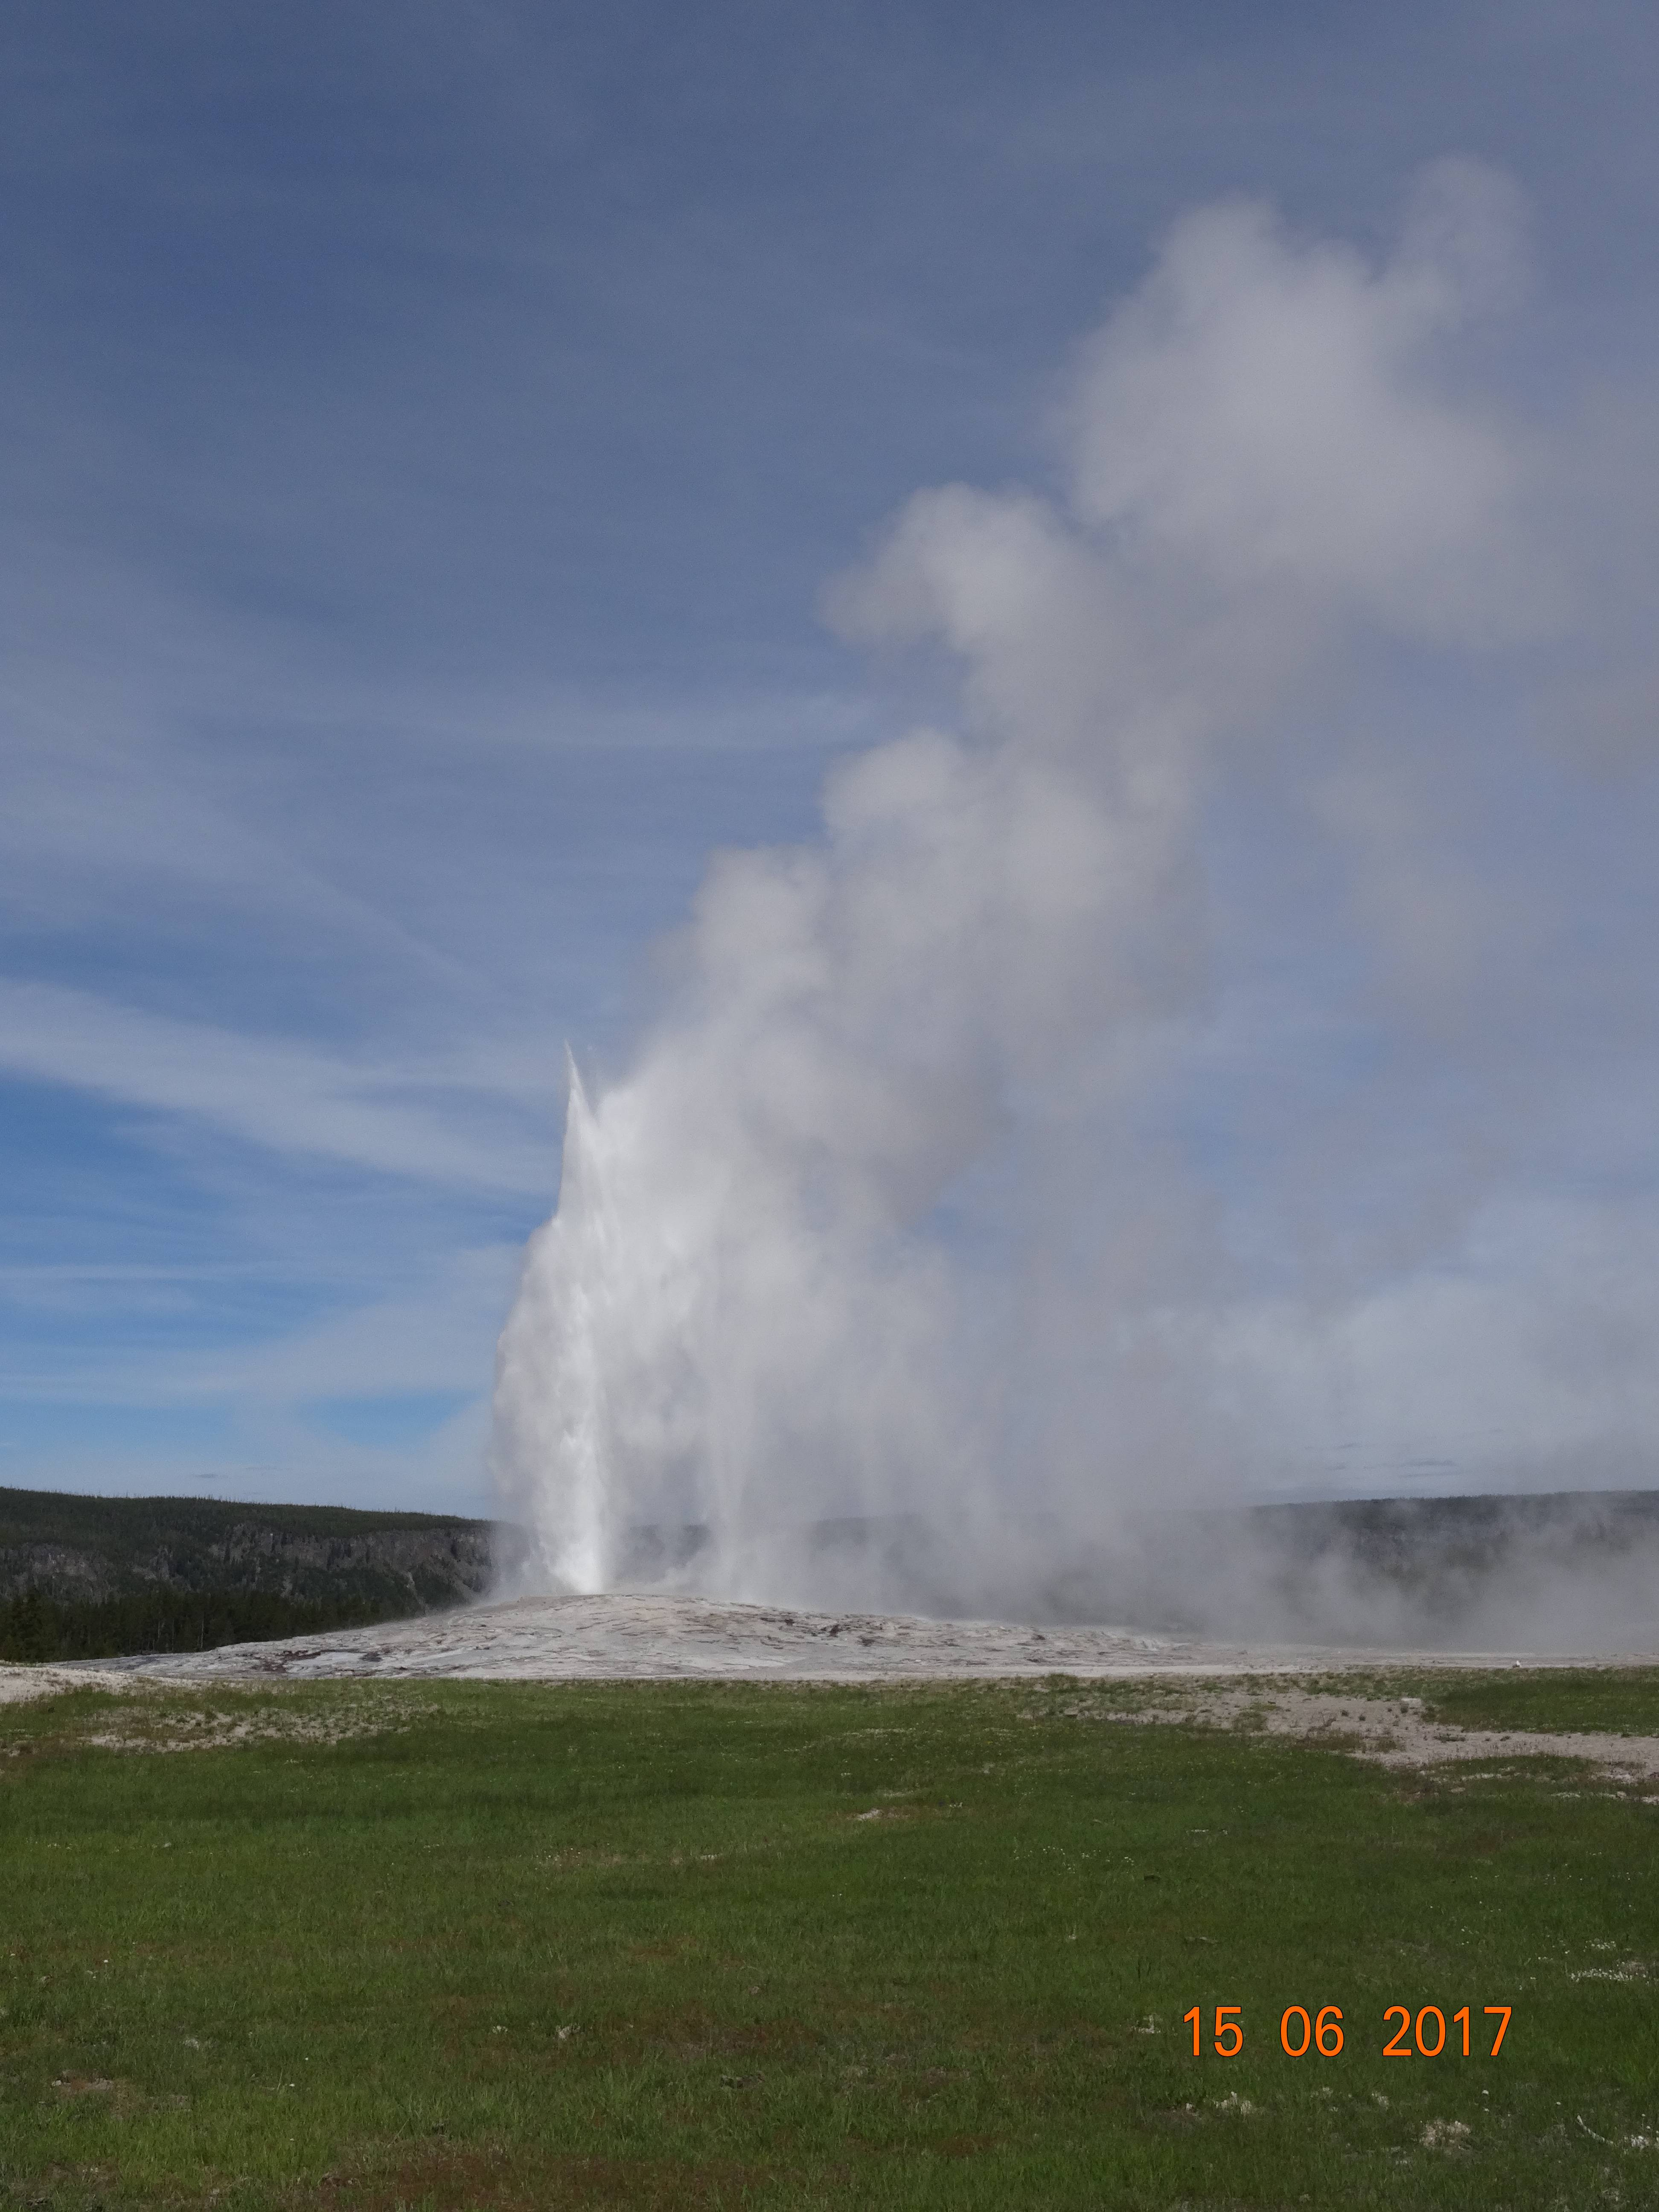 Photo 3: Yellowstone, quel parc merveilleux....